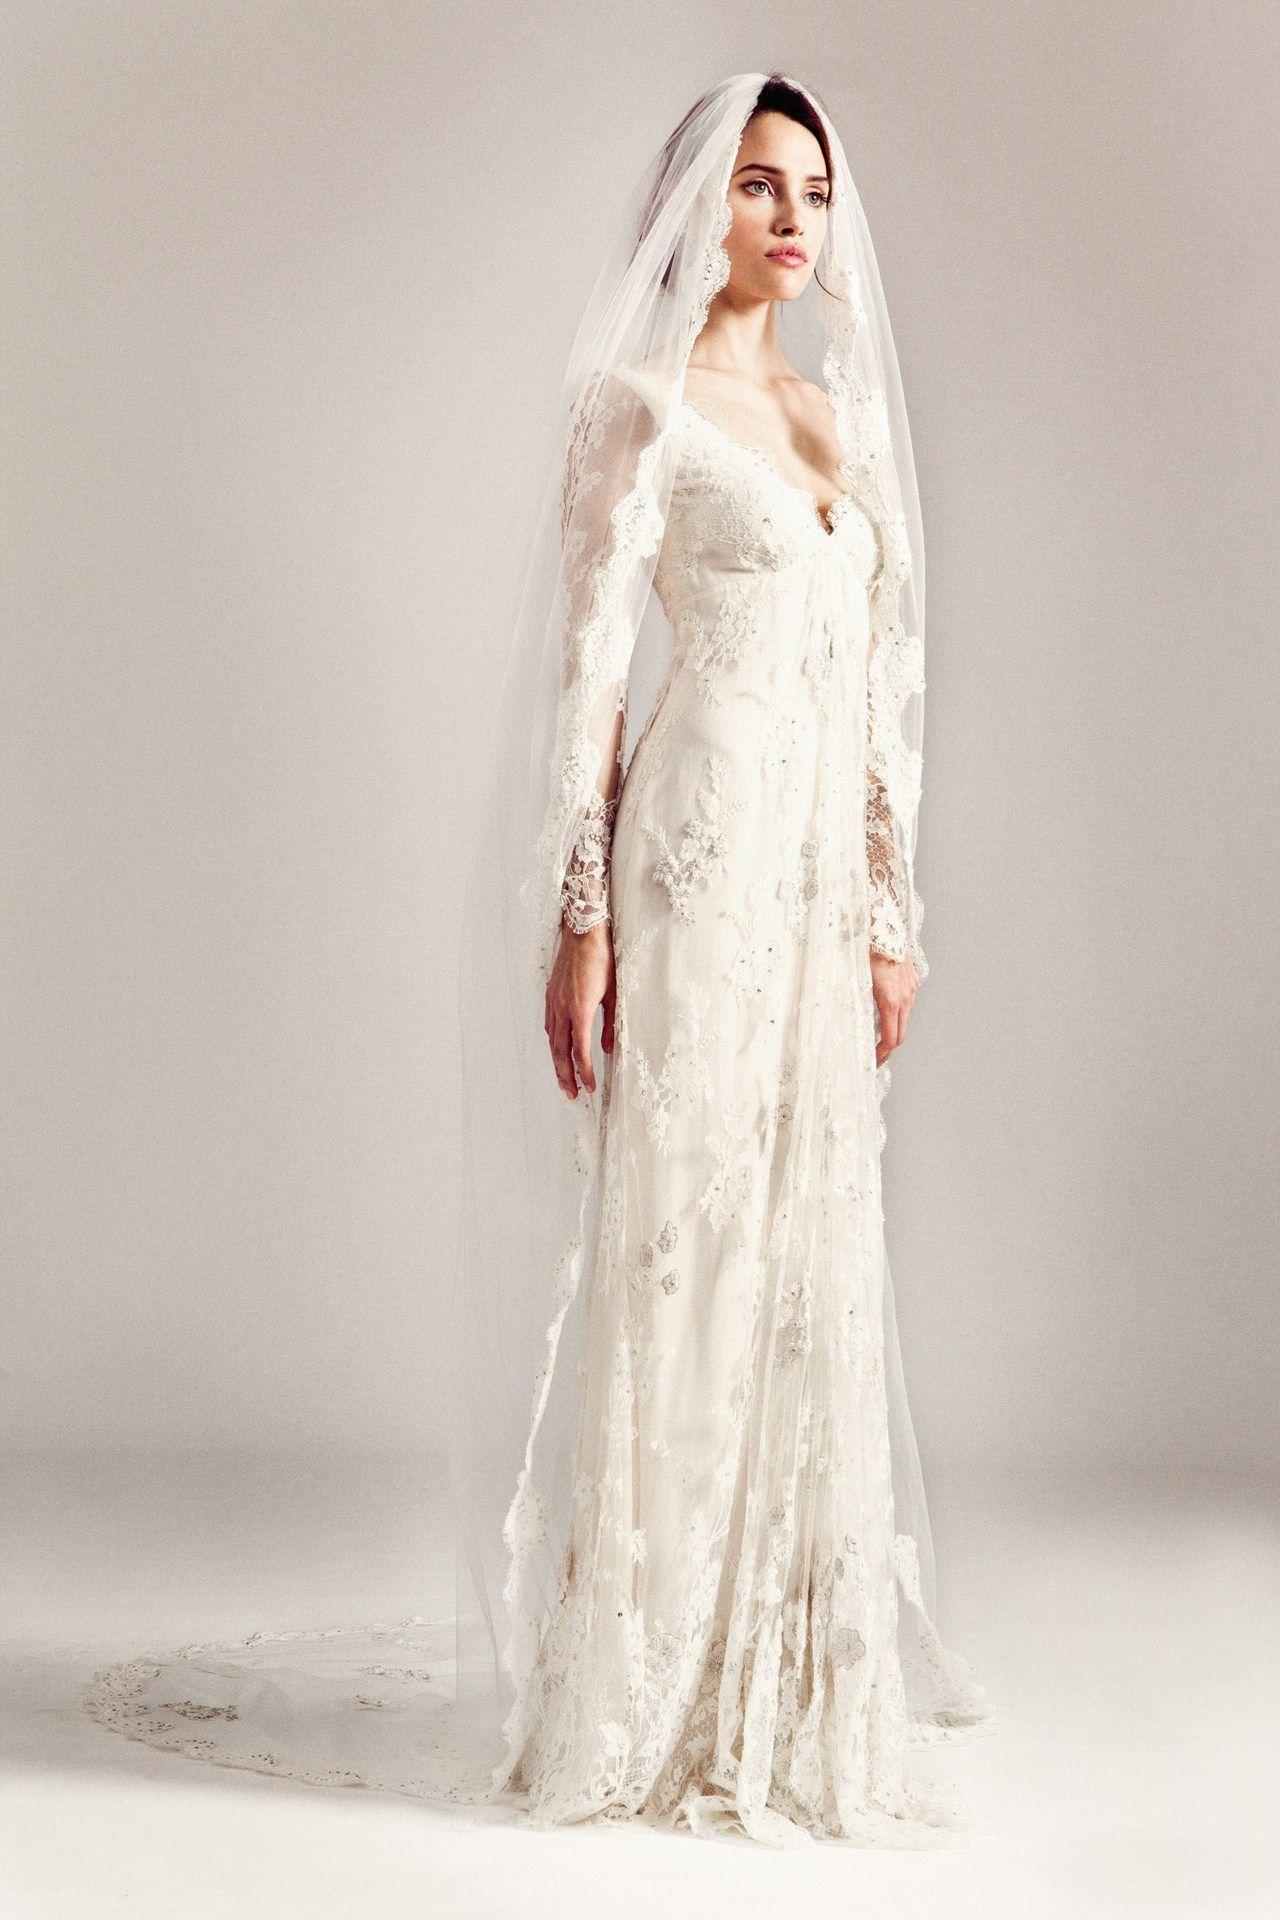 Boho wedding dress designers dresses for festival weddings